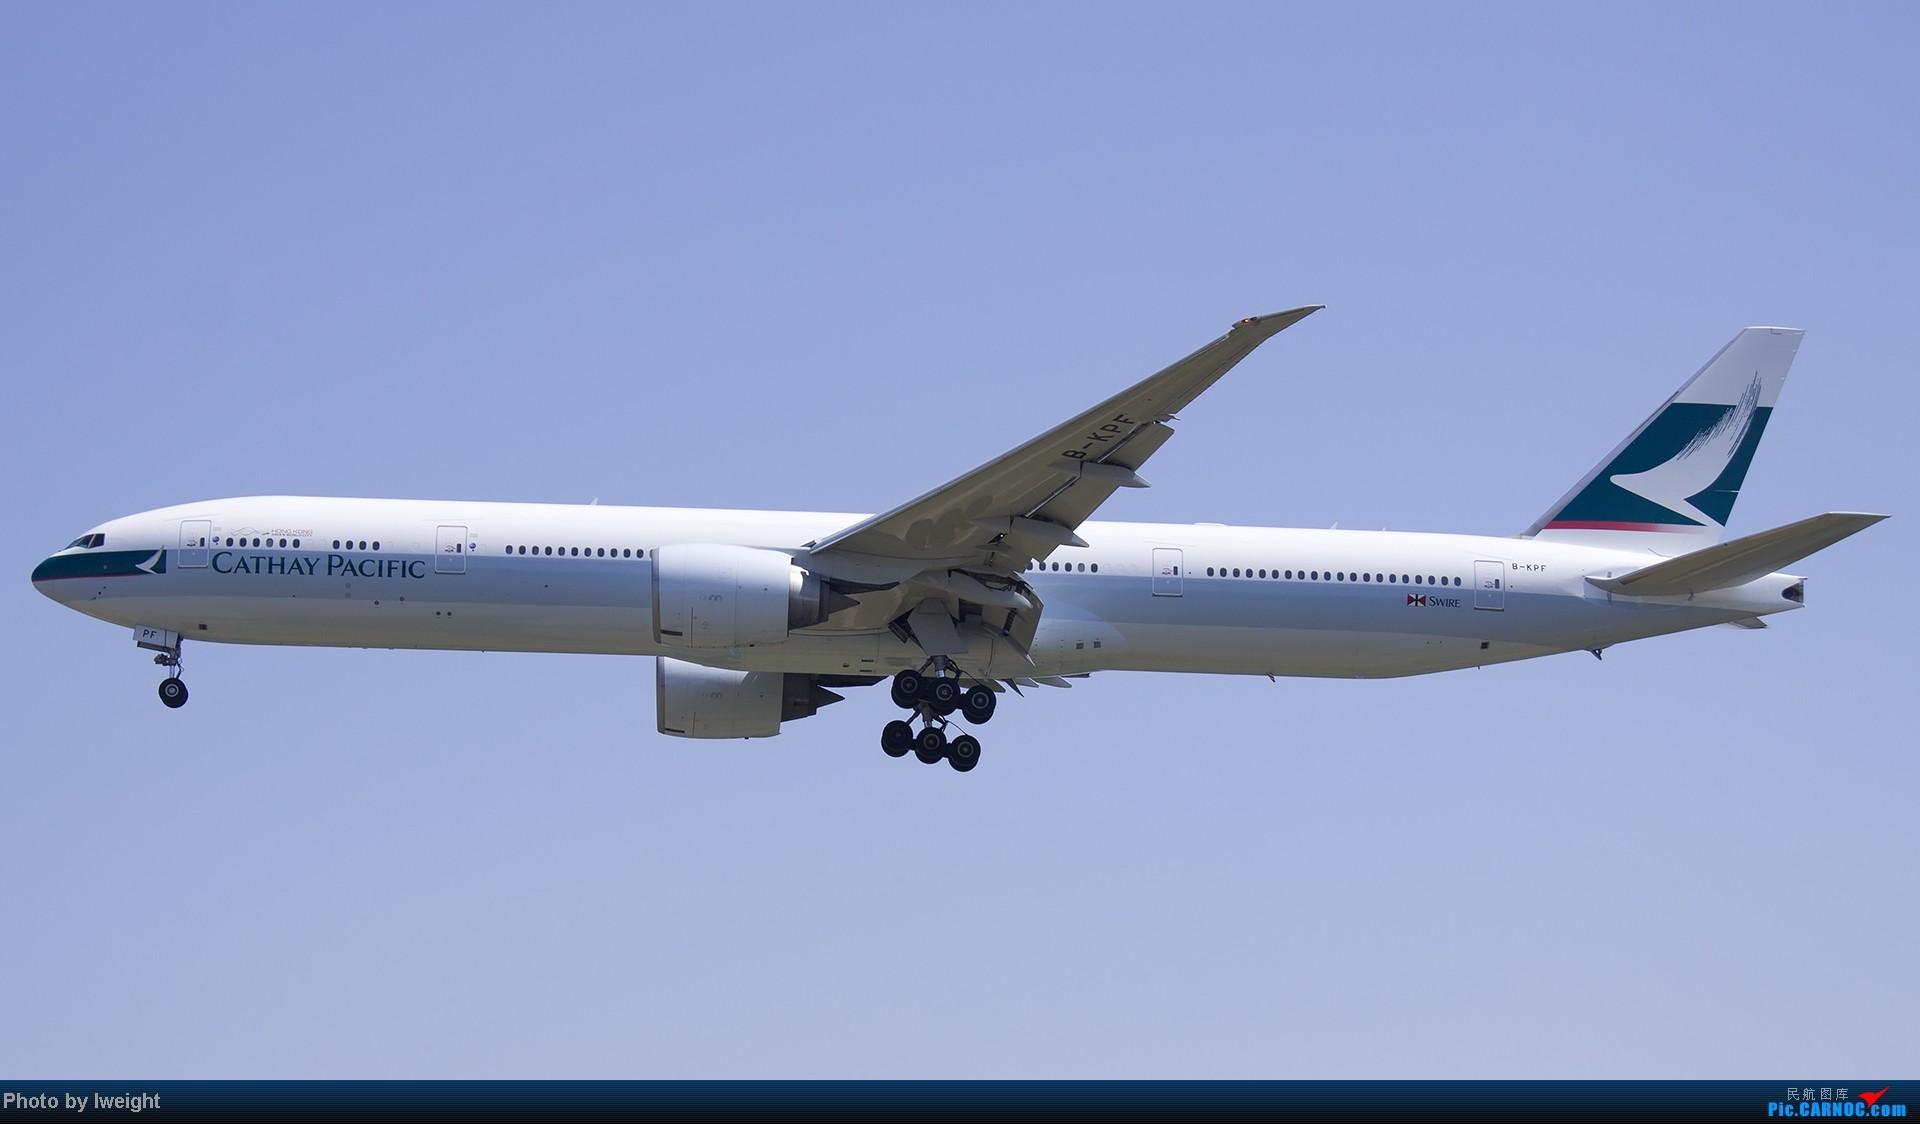 Re:[原创]北京难得的好天气,收获多种机型和彩绘,遗憾的是再次错过卡航巴塞罗那彩绘 BOEING 777-300 B-KPF 中国北京首都机场